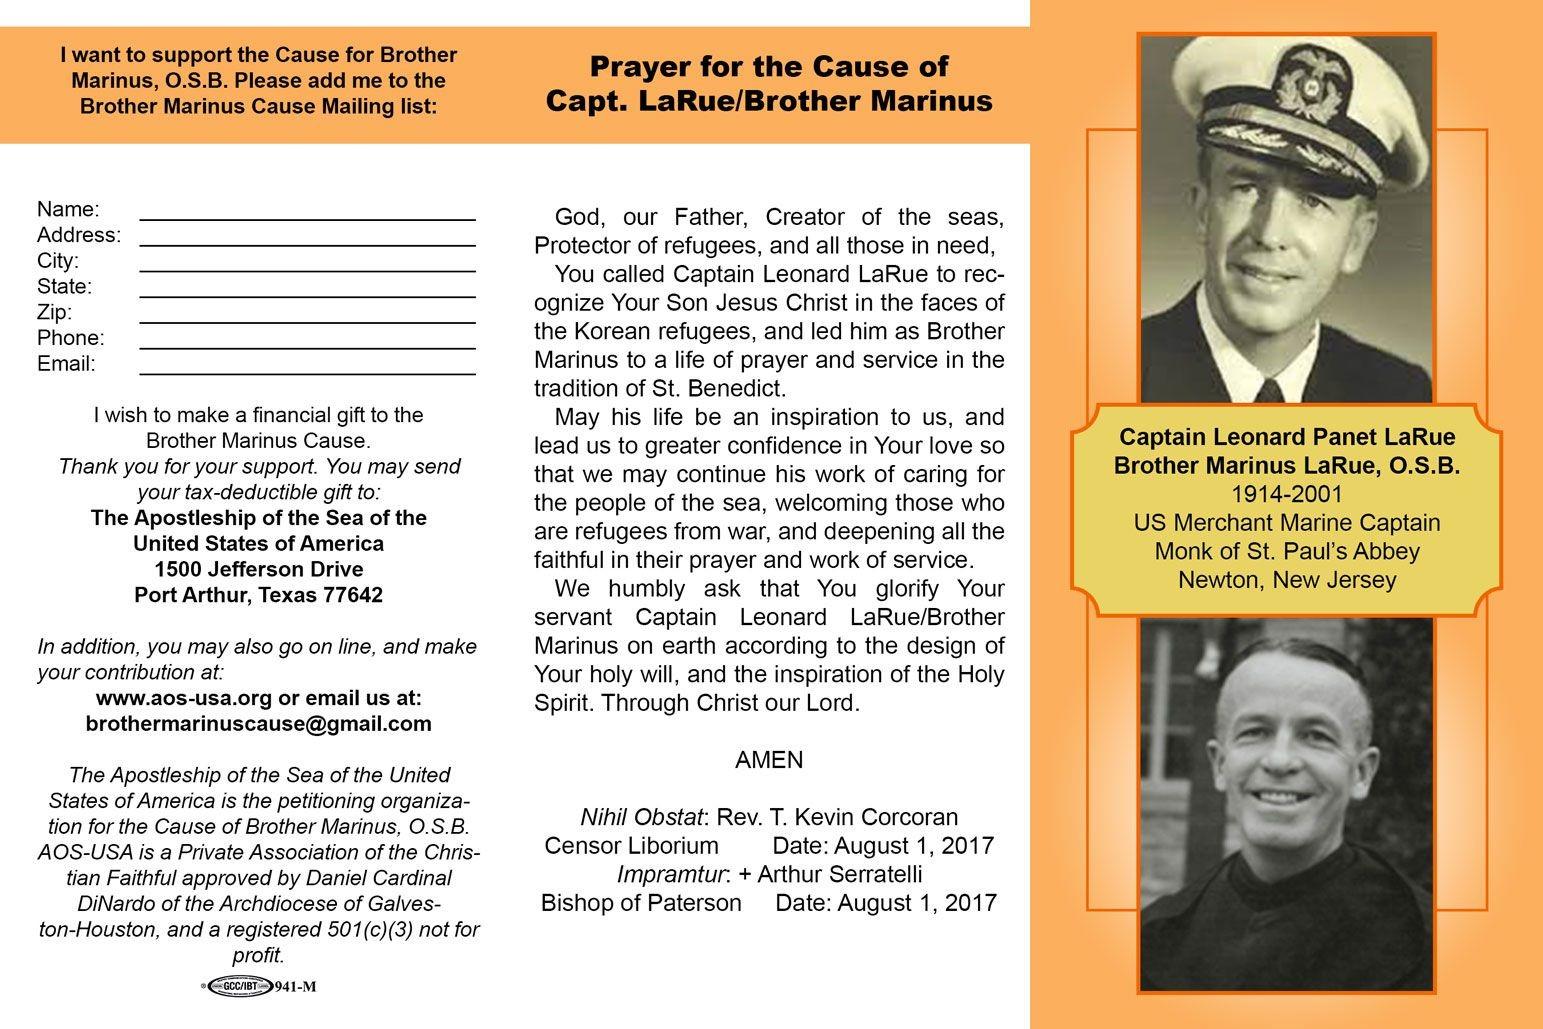 Brother Marinus prayer